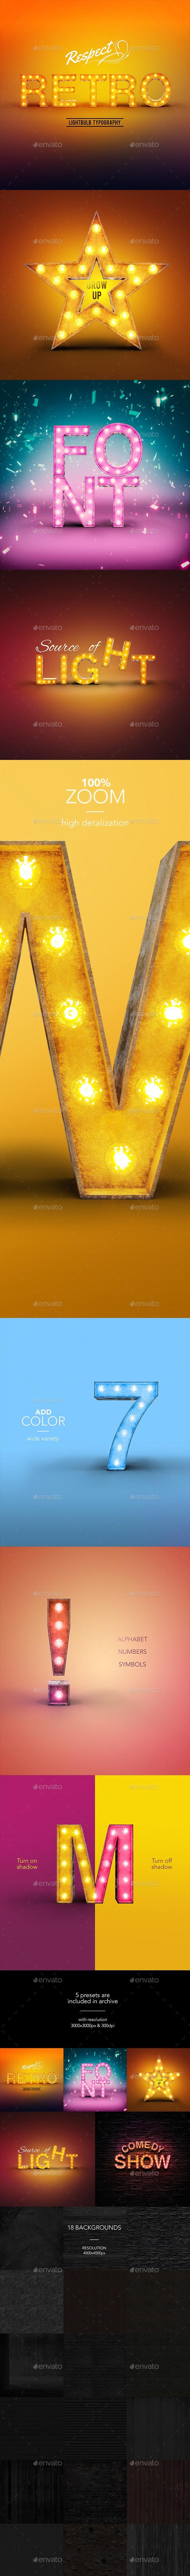 Retro Lightbulb Font - Text 3D Renders